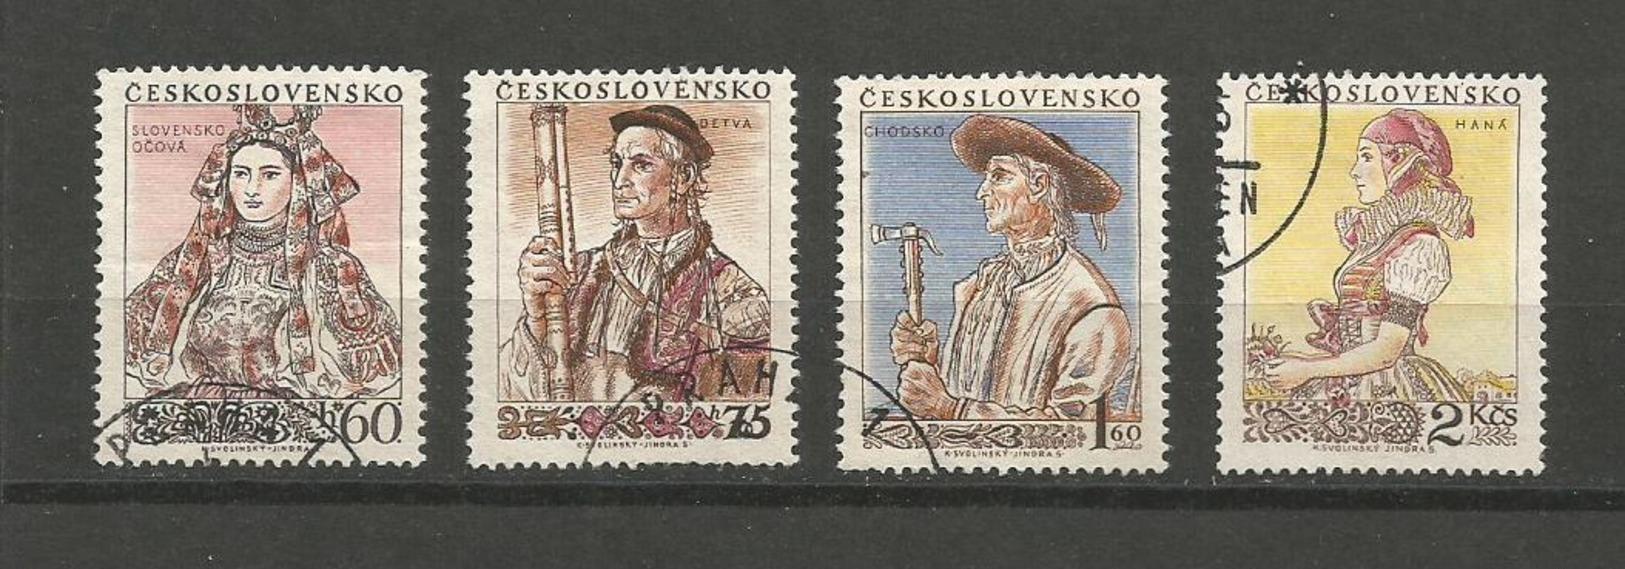 CZECHOSLOVAKIA 1955 NATIONAL COSTUMES COMPLETE SET - USED - Tsjechoslowakije